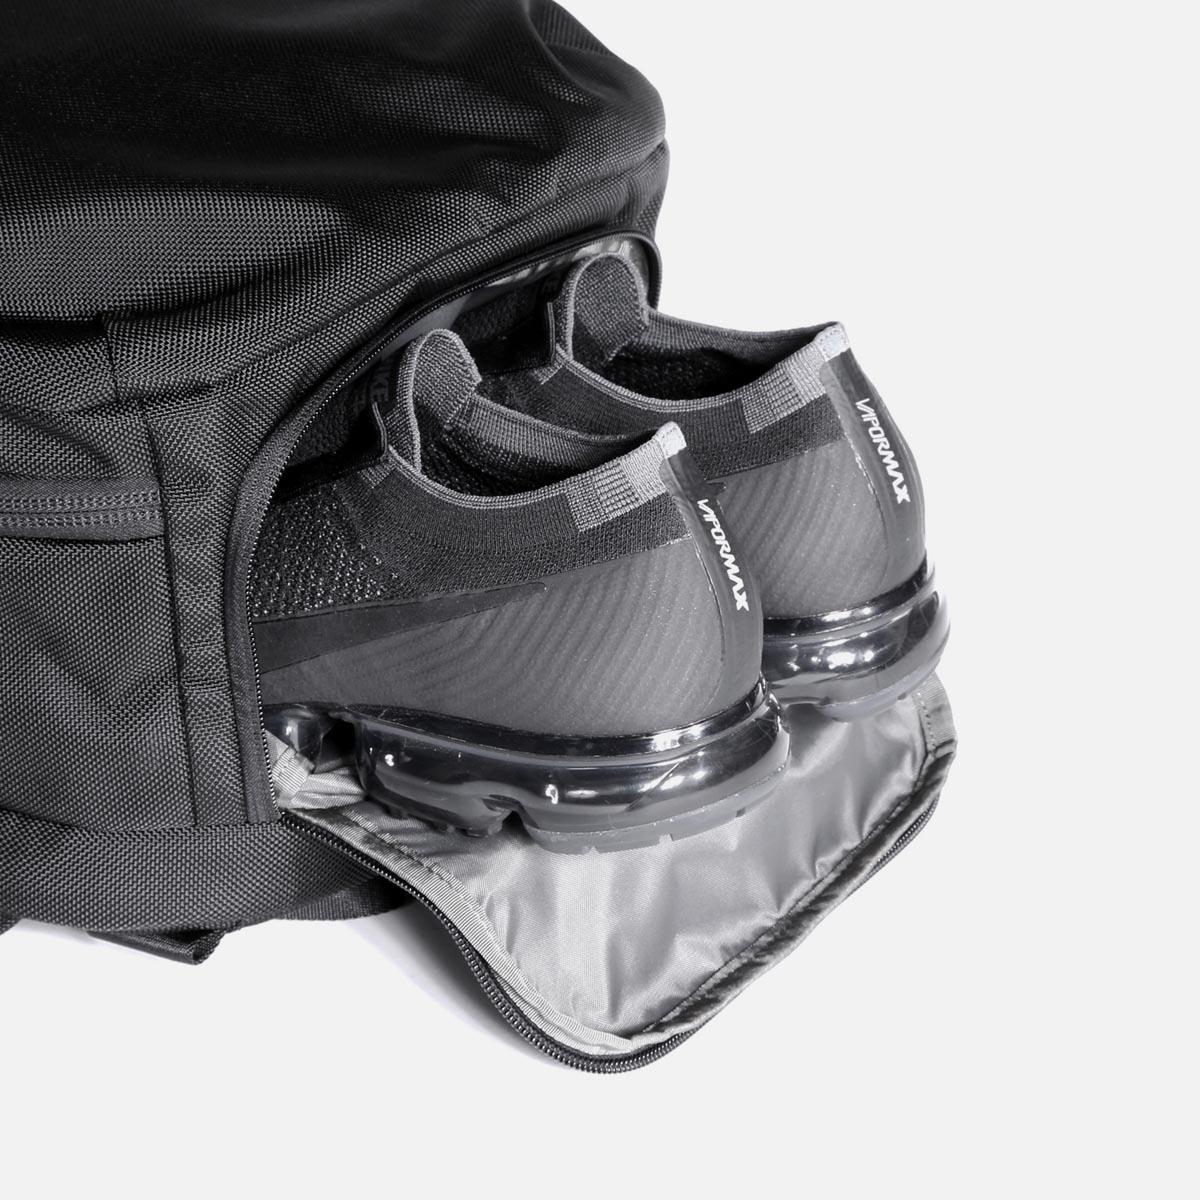 21007_tp2_black_shoes.JPG